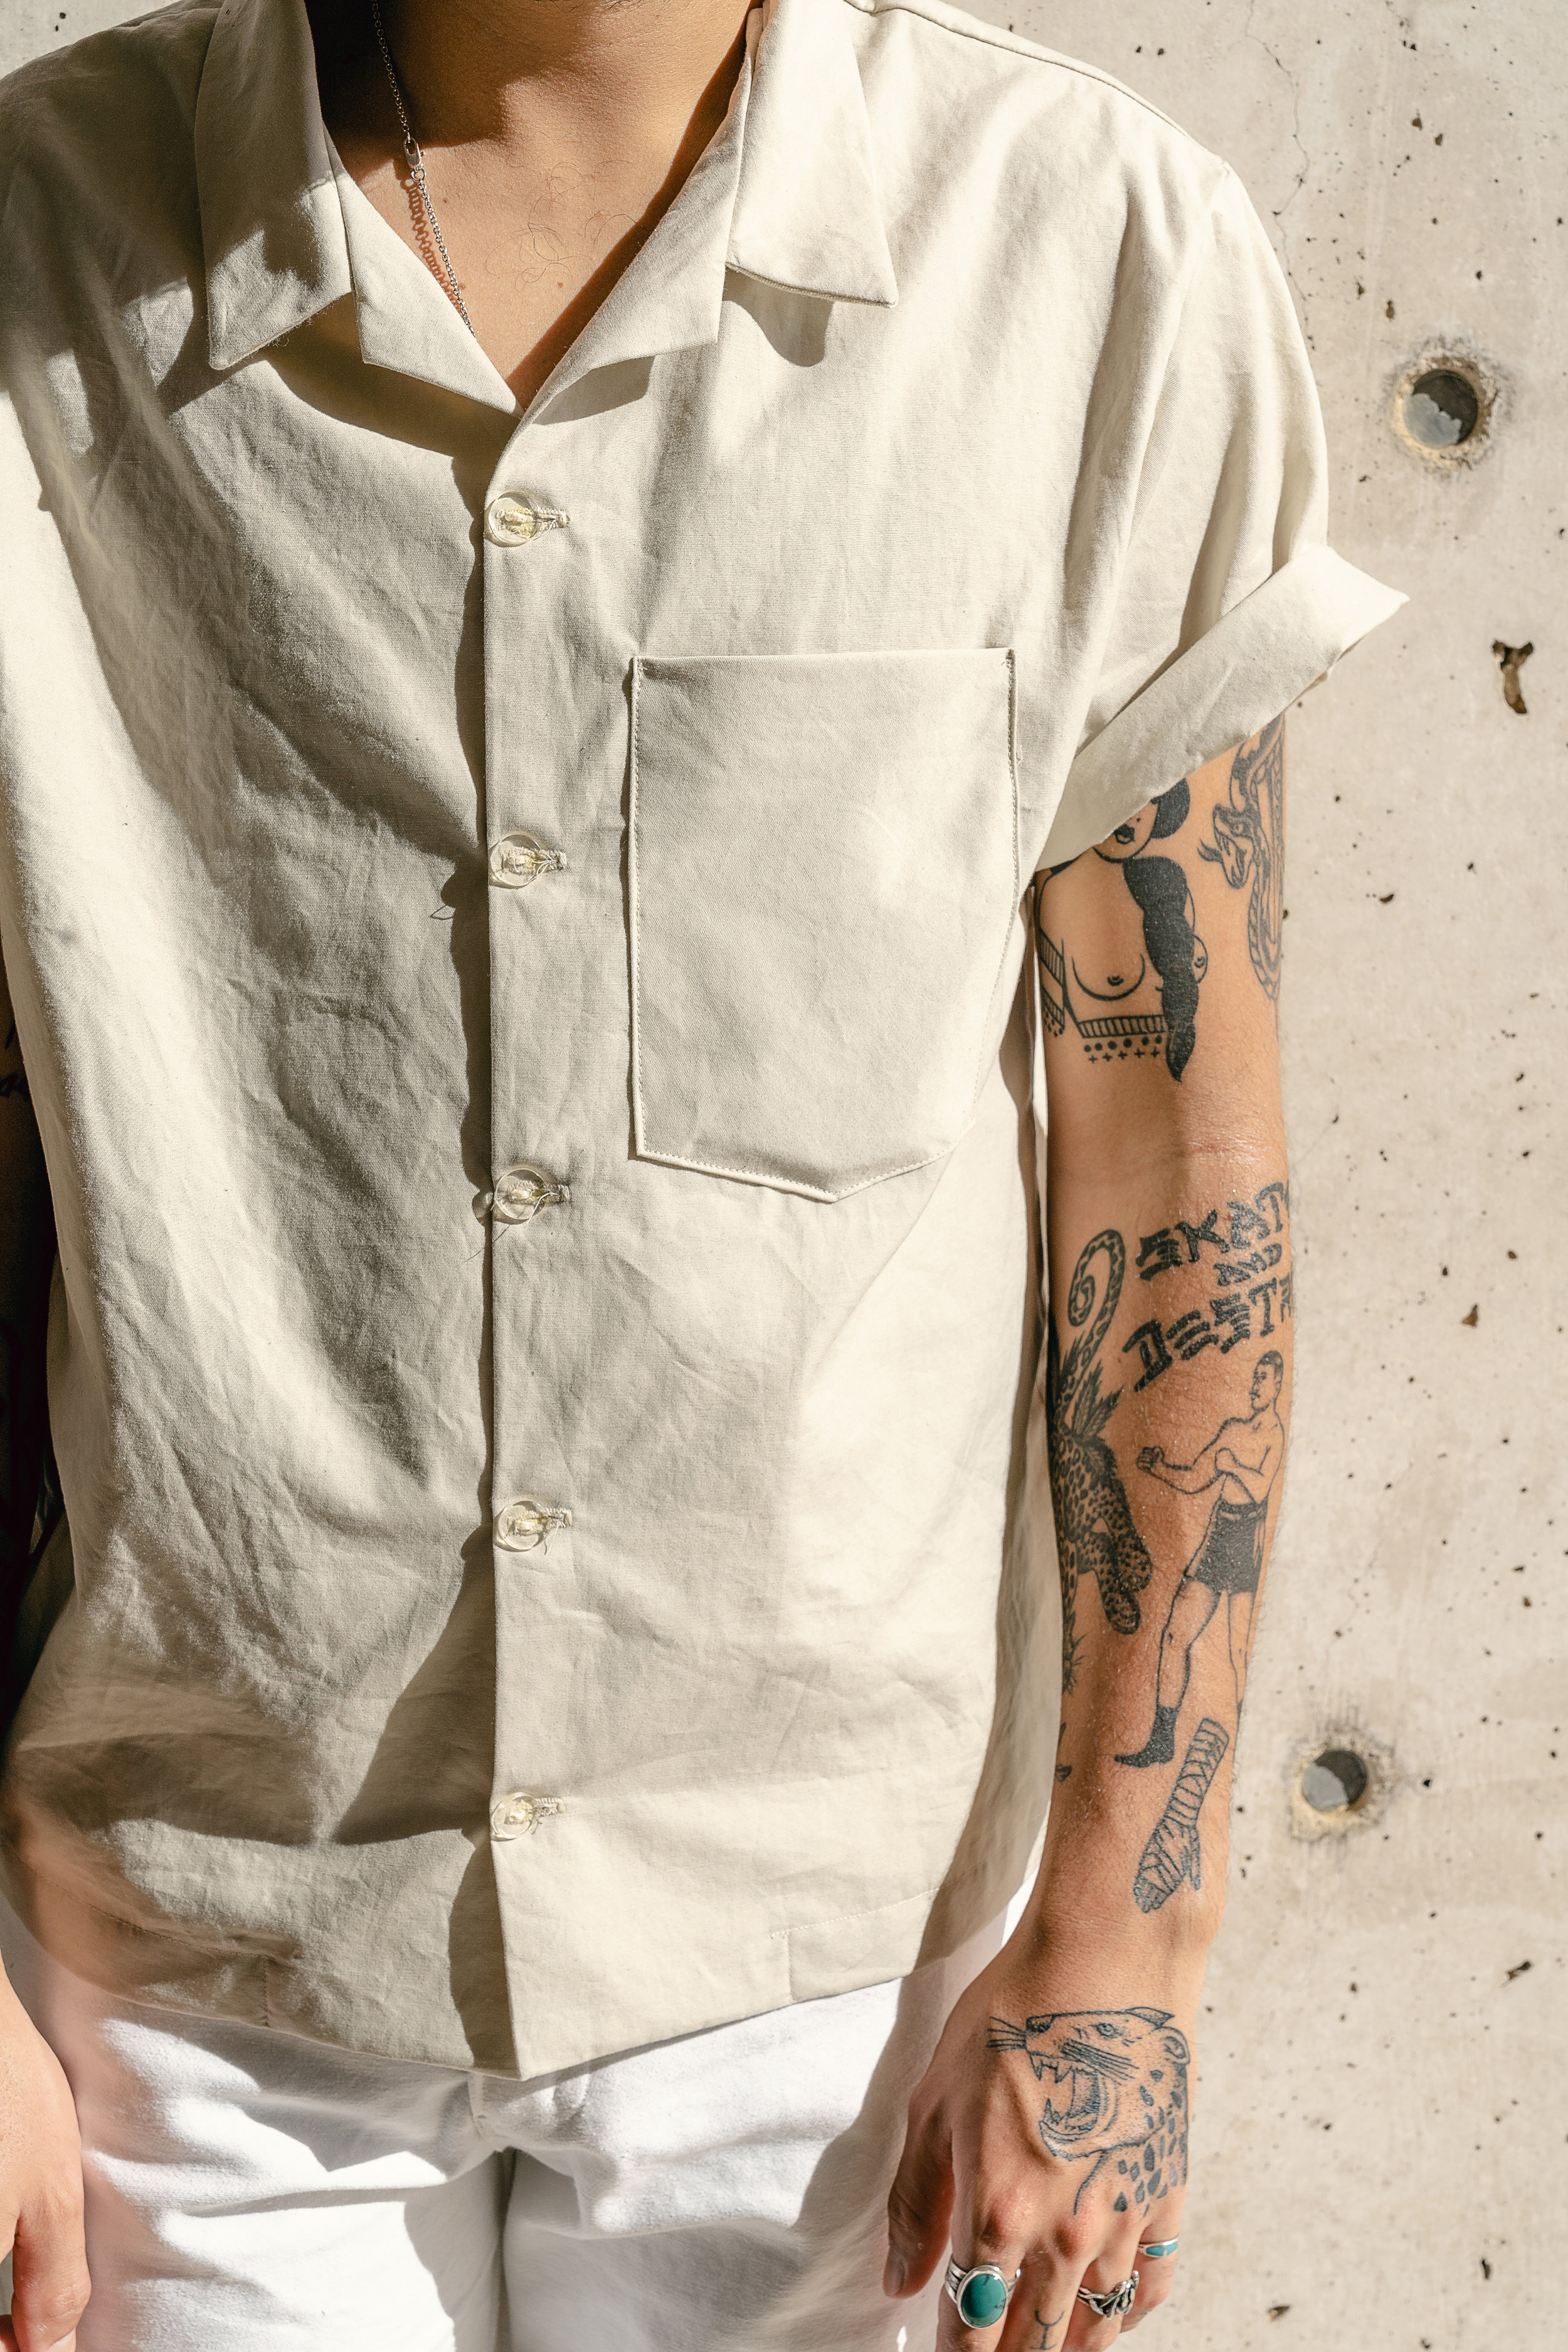 shirtdetail-salkcolor.jpg